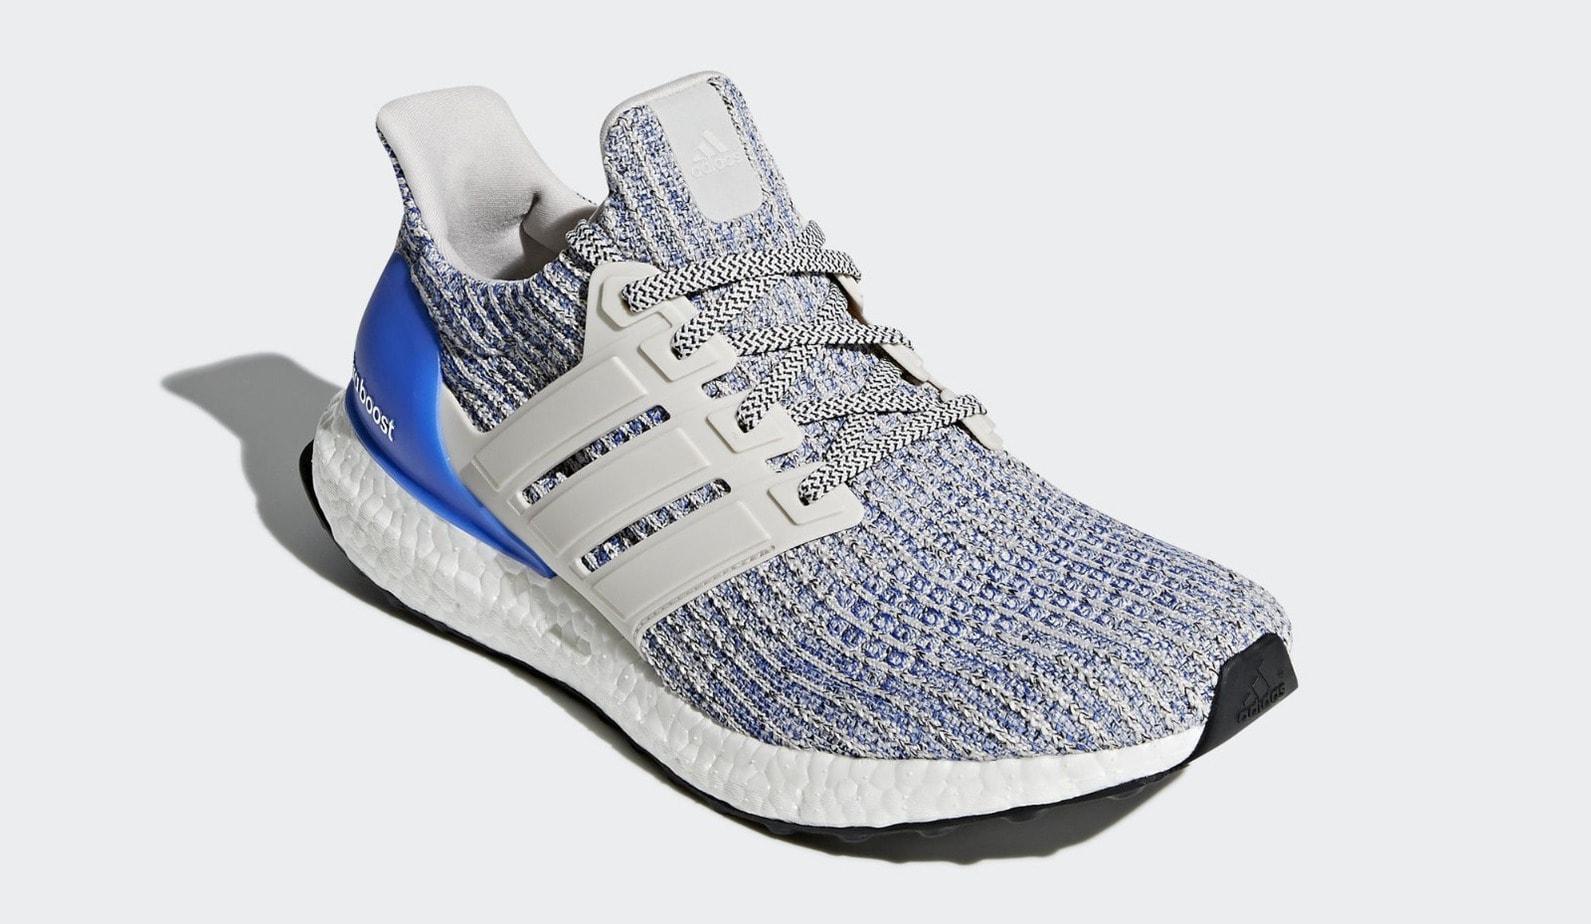 Adidas Ultra Boost 4 0 Chalk Pearl Carbon 2018